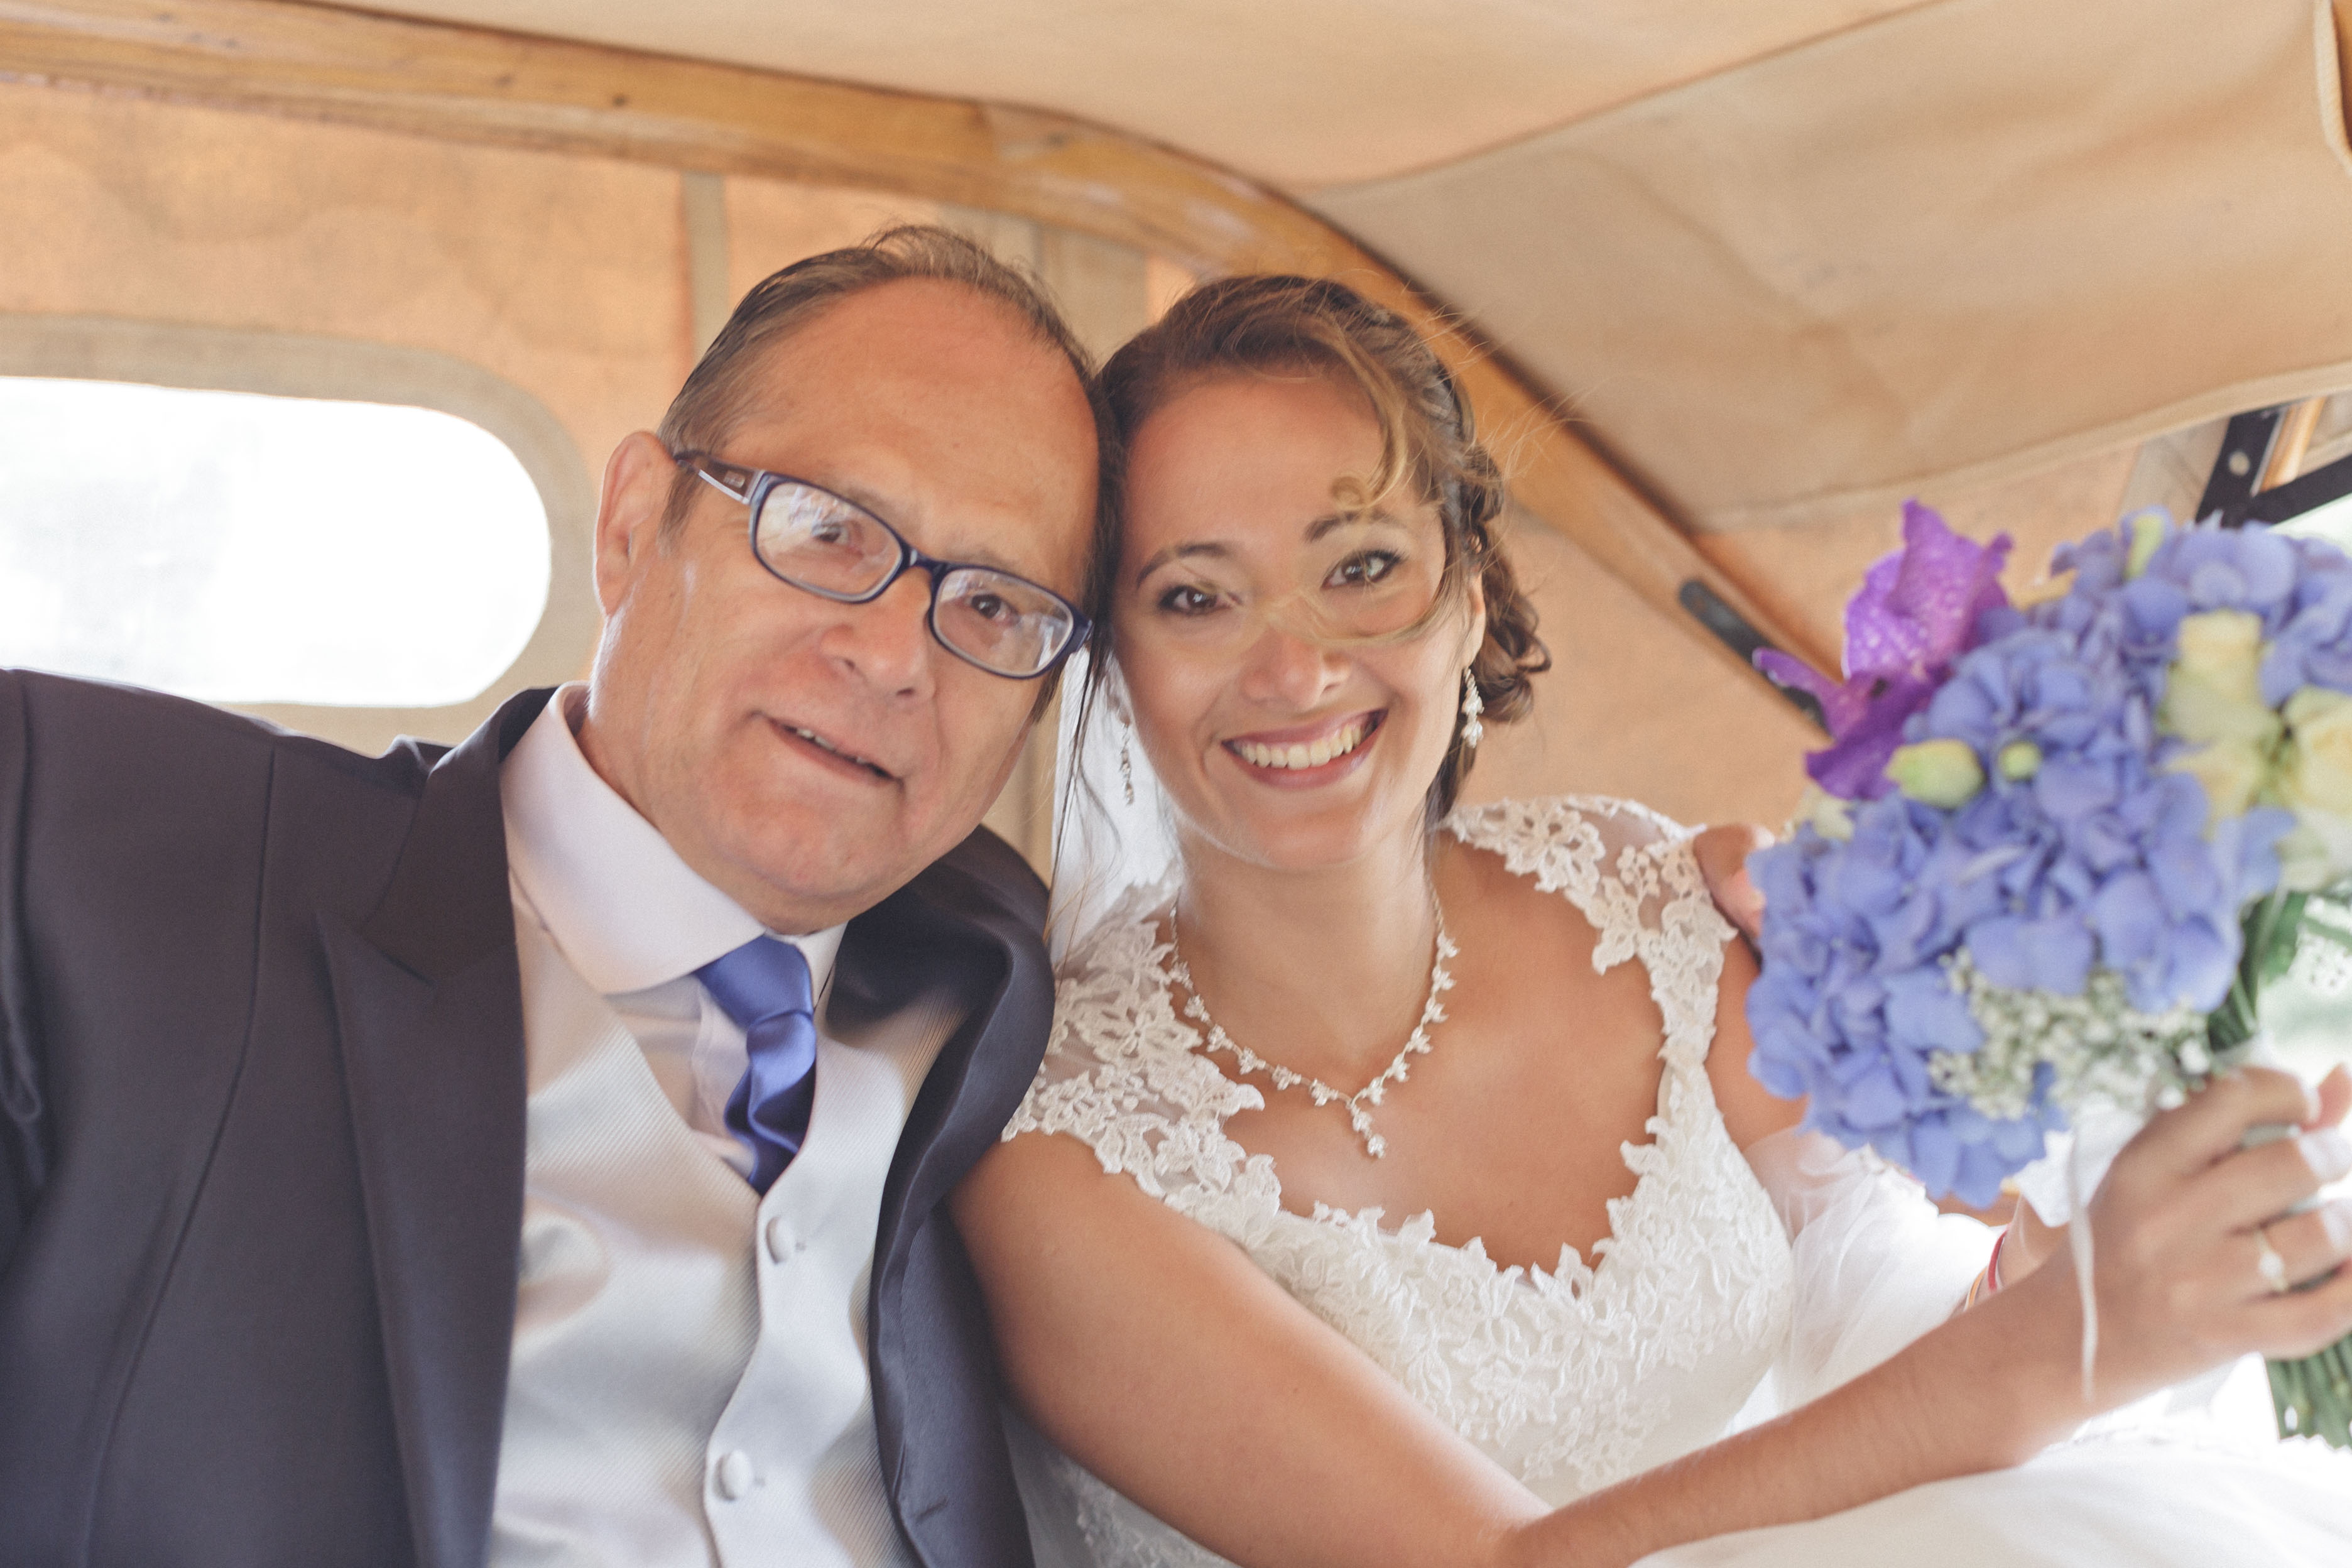 Photographie - Mariage - Bretagne - Finistere - Morbihan - Lilian Vezin Photographie (11)